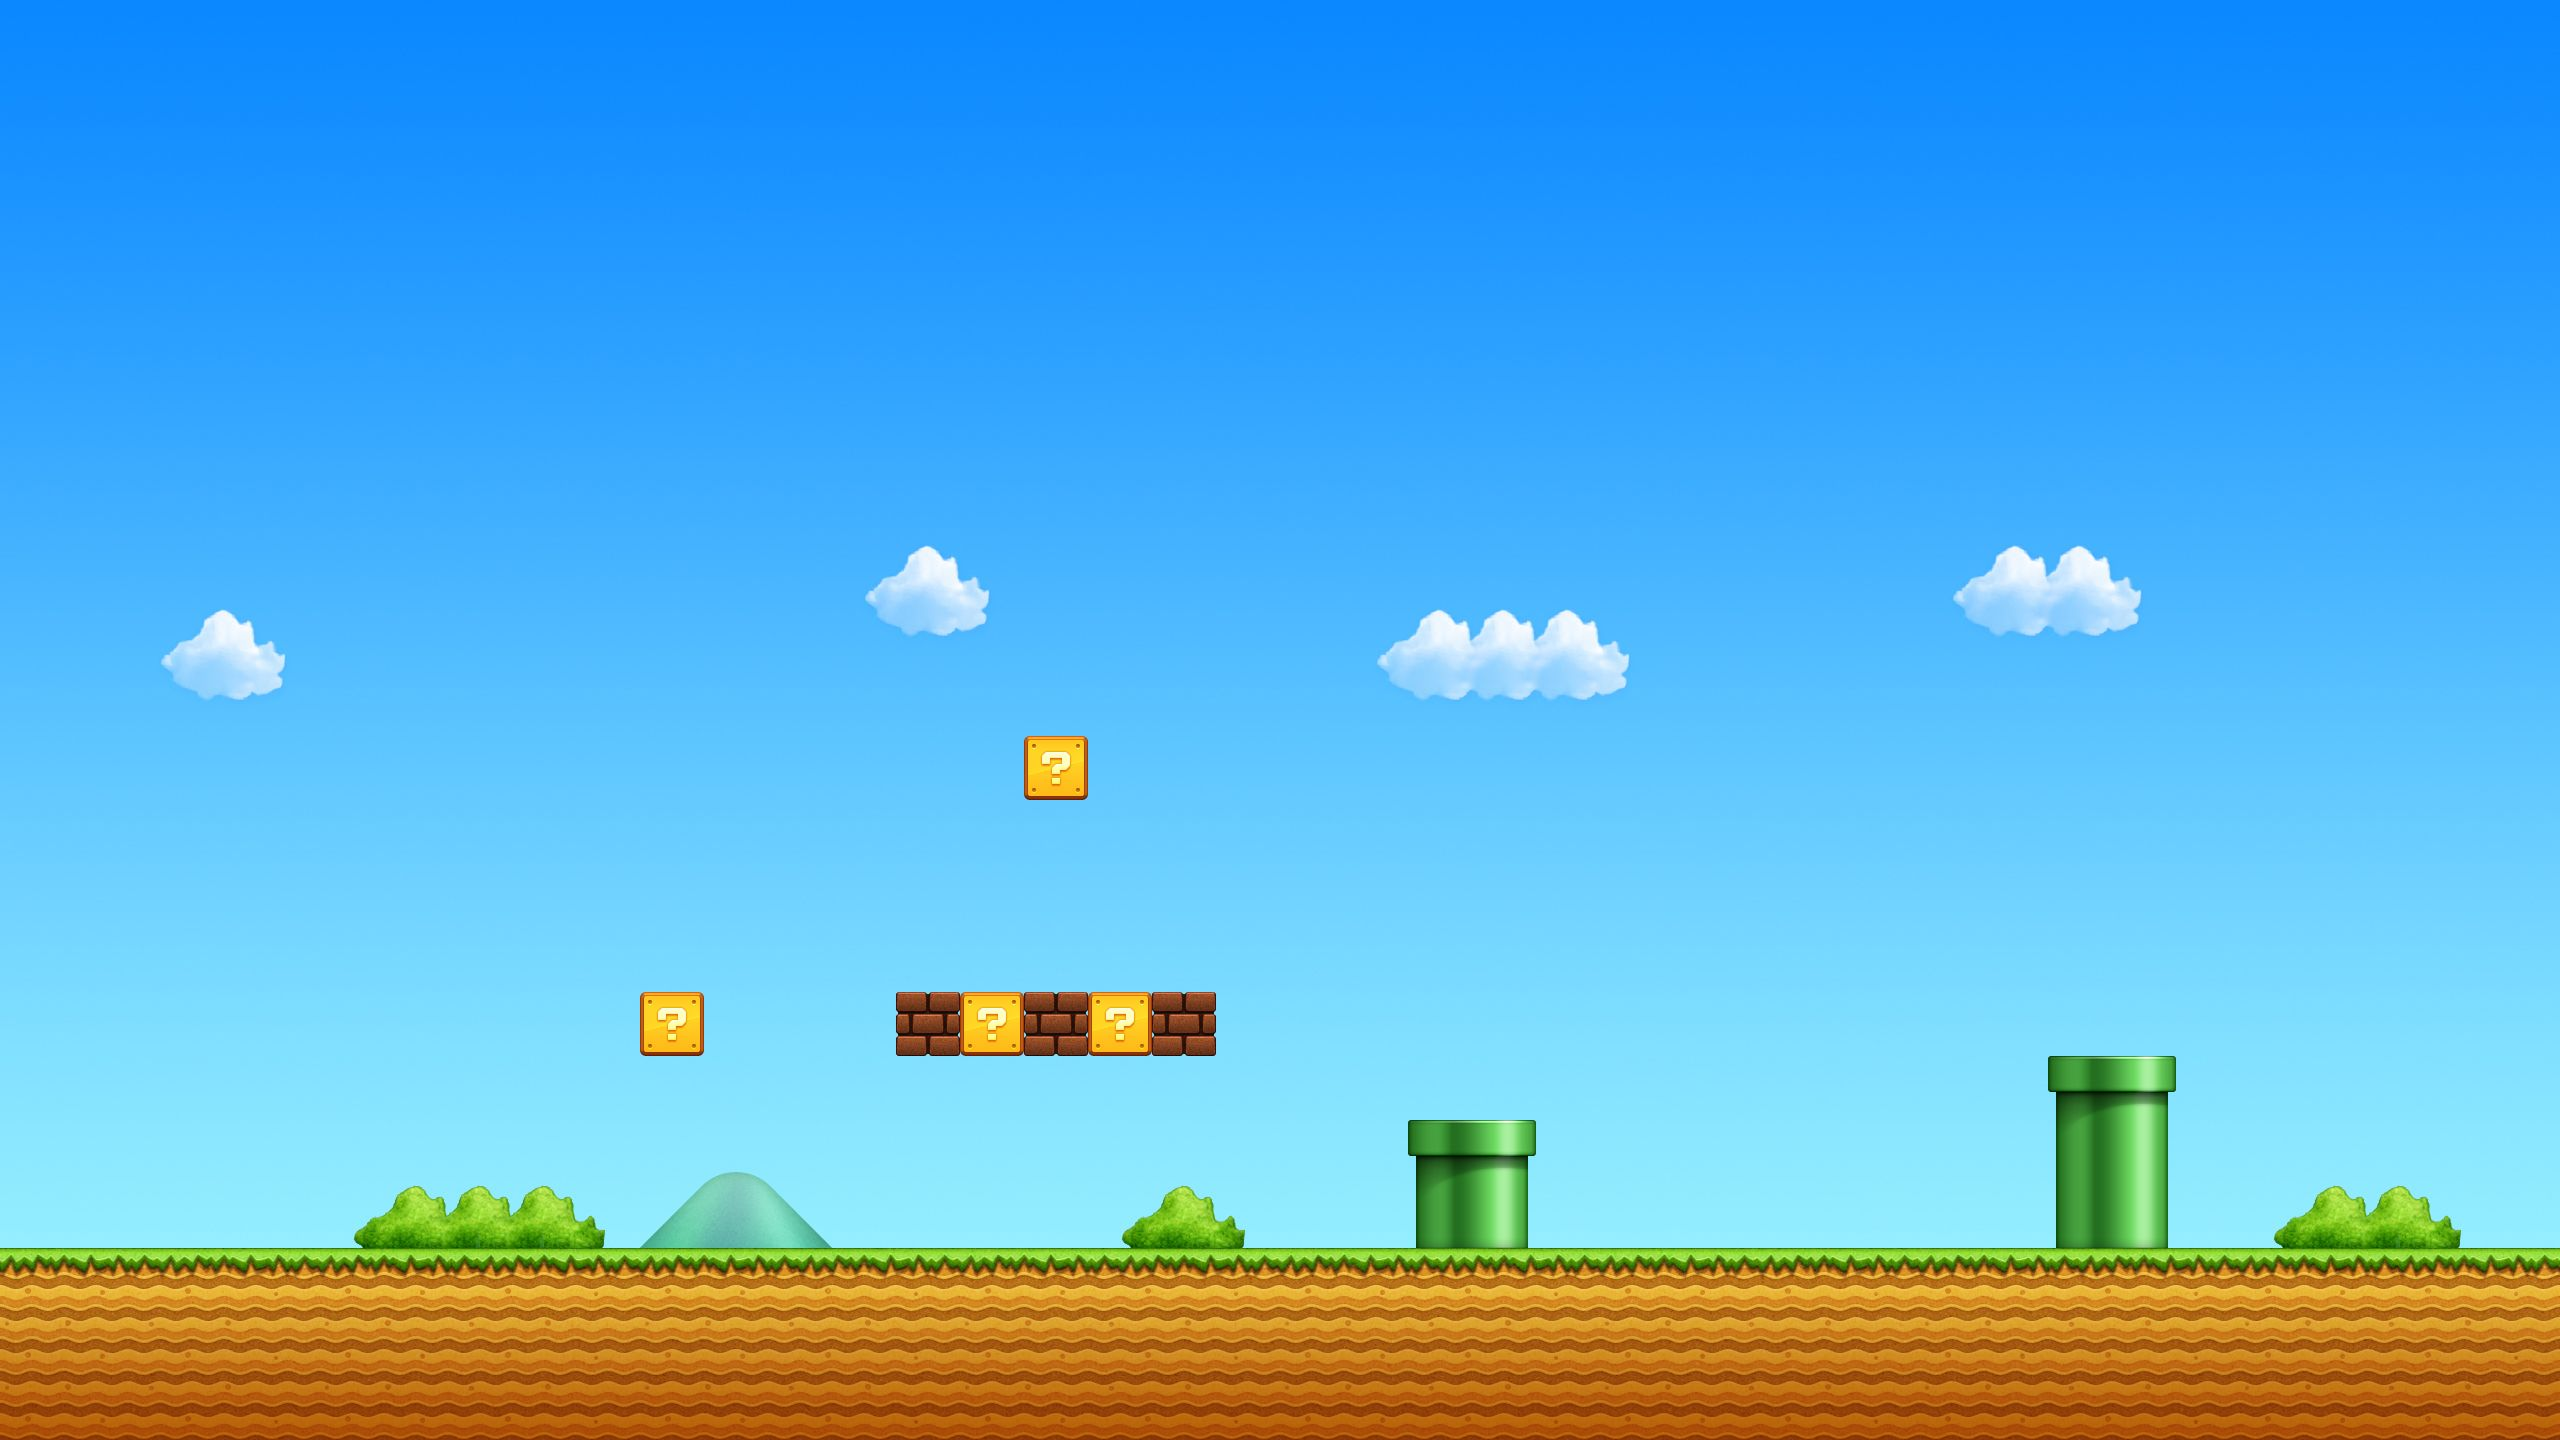 Games Nintendo Video Games Mario Super Beginning Retro Hd Wallpaper